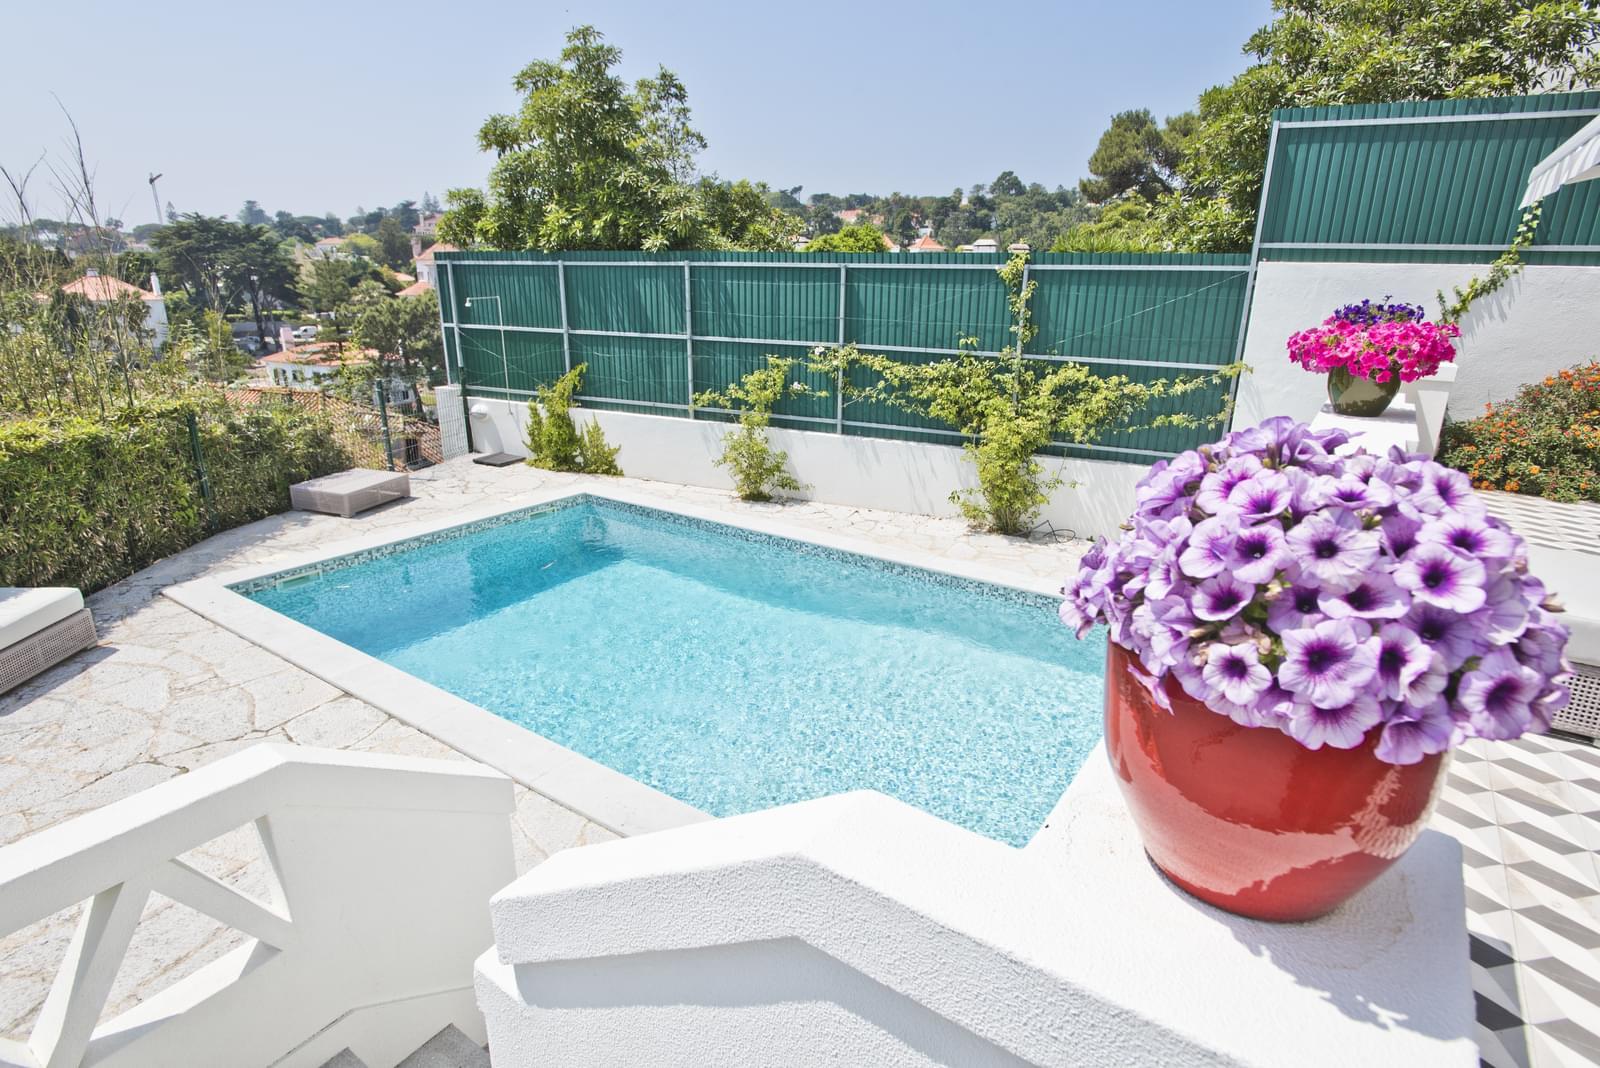 Moradia T4+3 com piscina